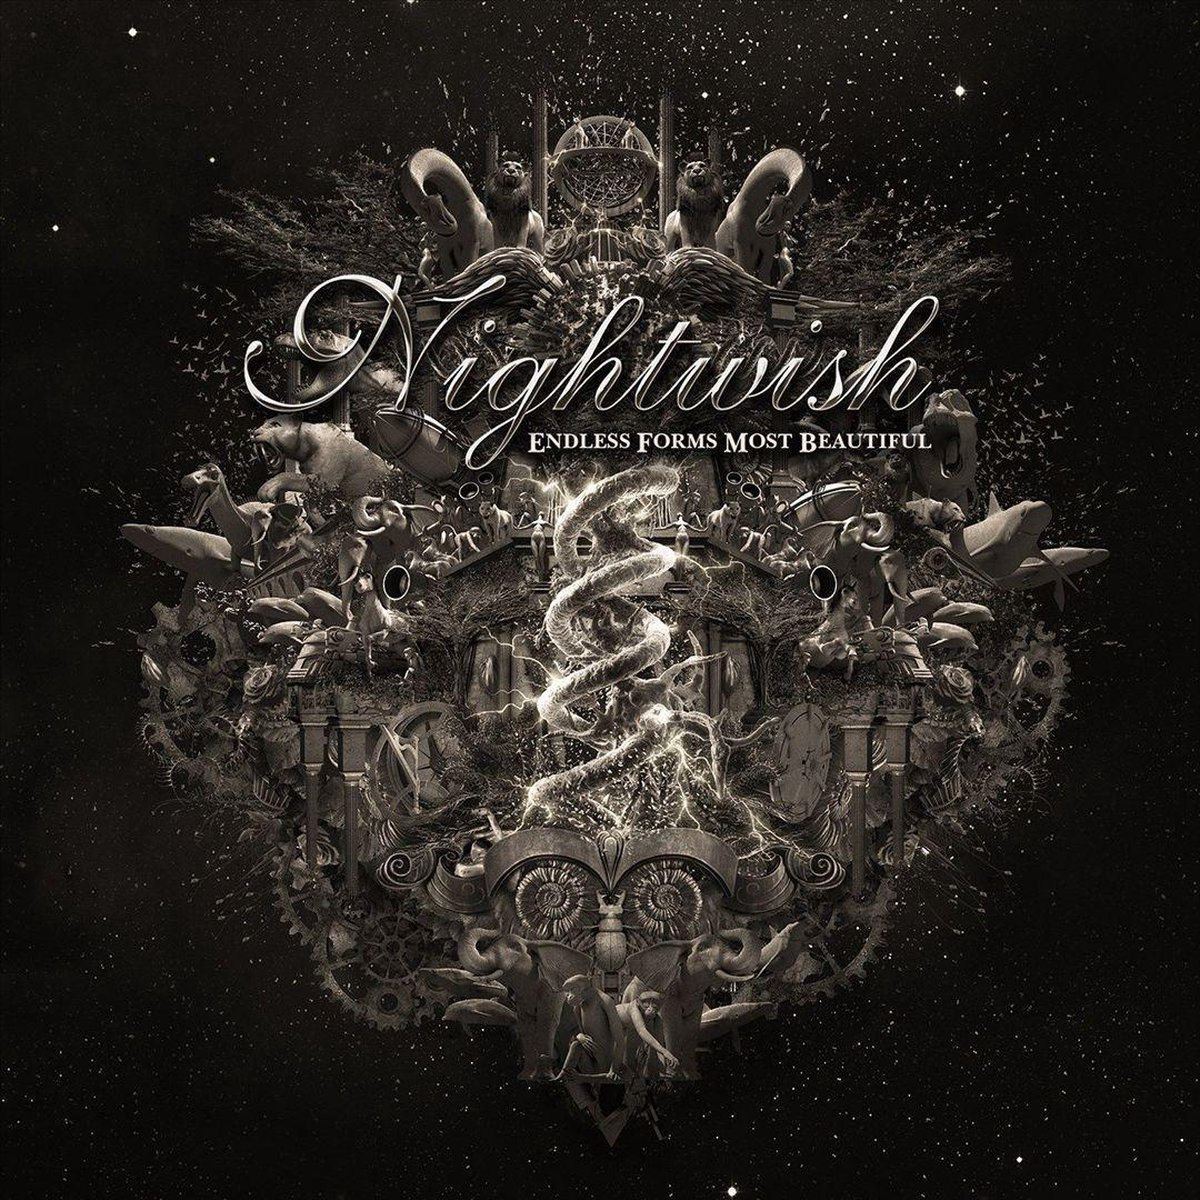 Endless Forms Most Beautiful - Nightwish